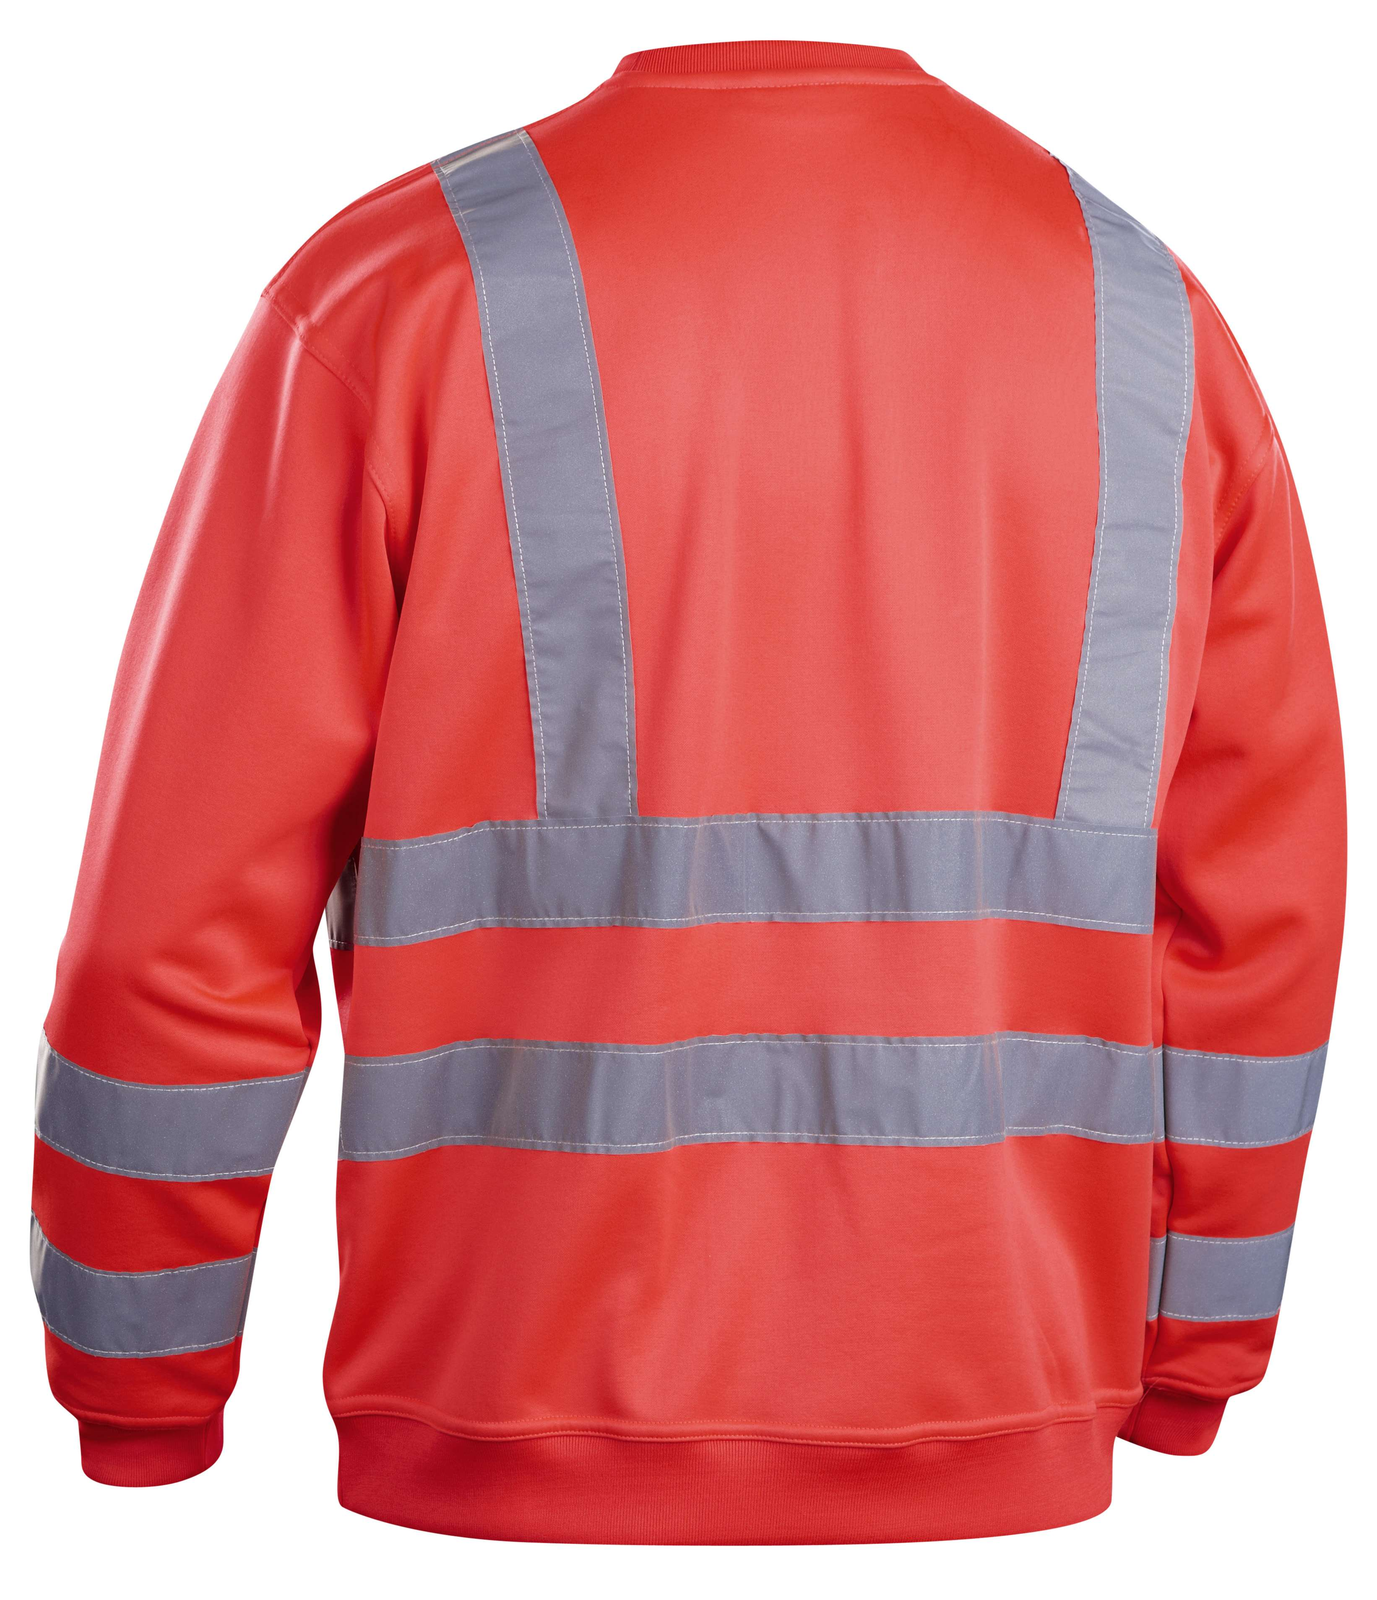 Blaklader Truien 33411974 High Vis fluo-rood(5500)